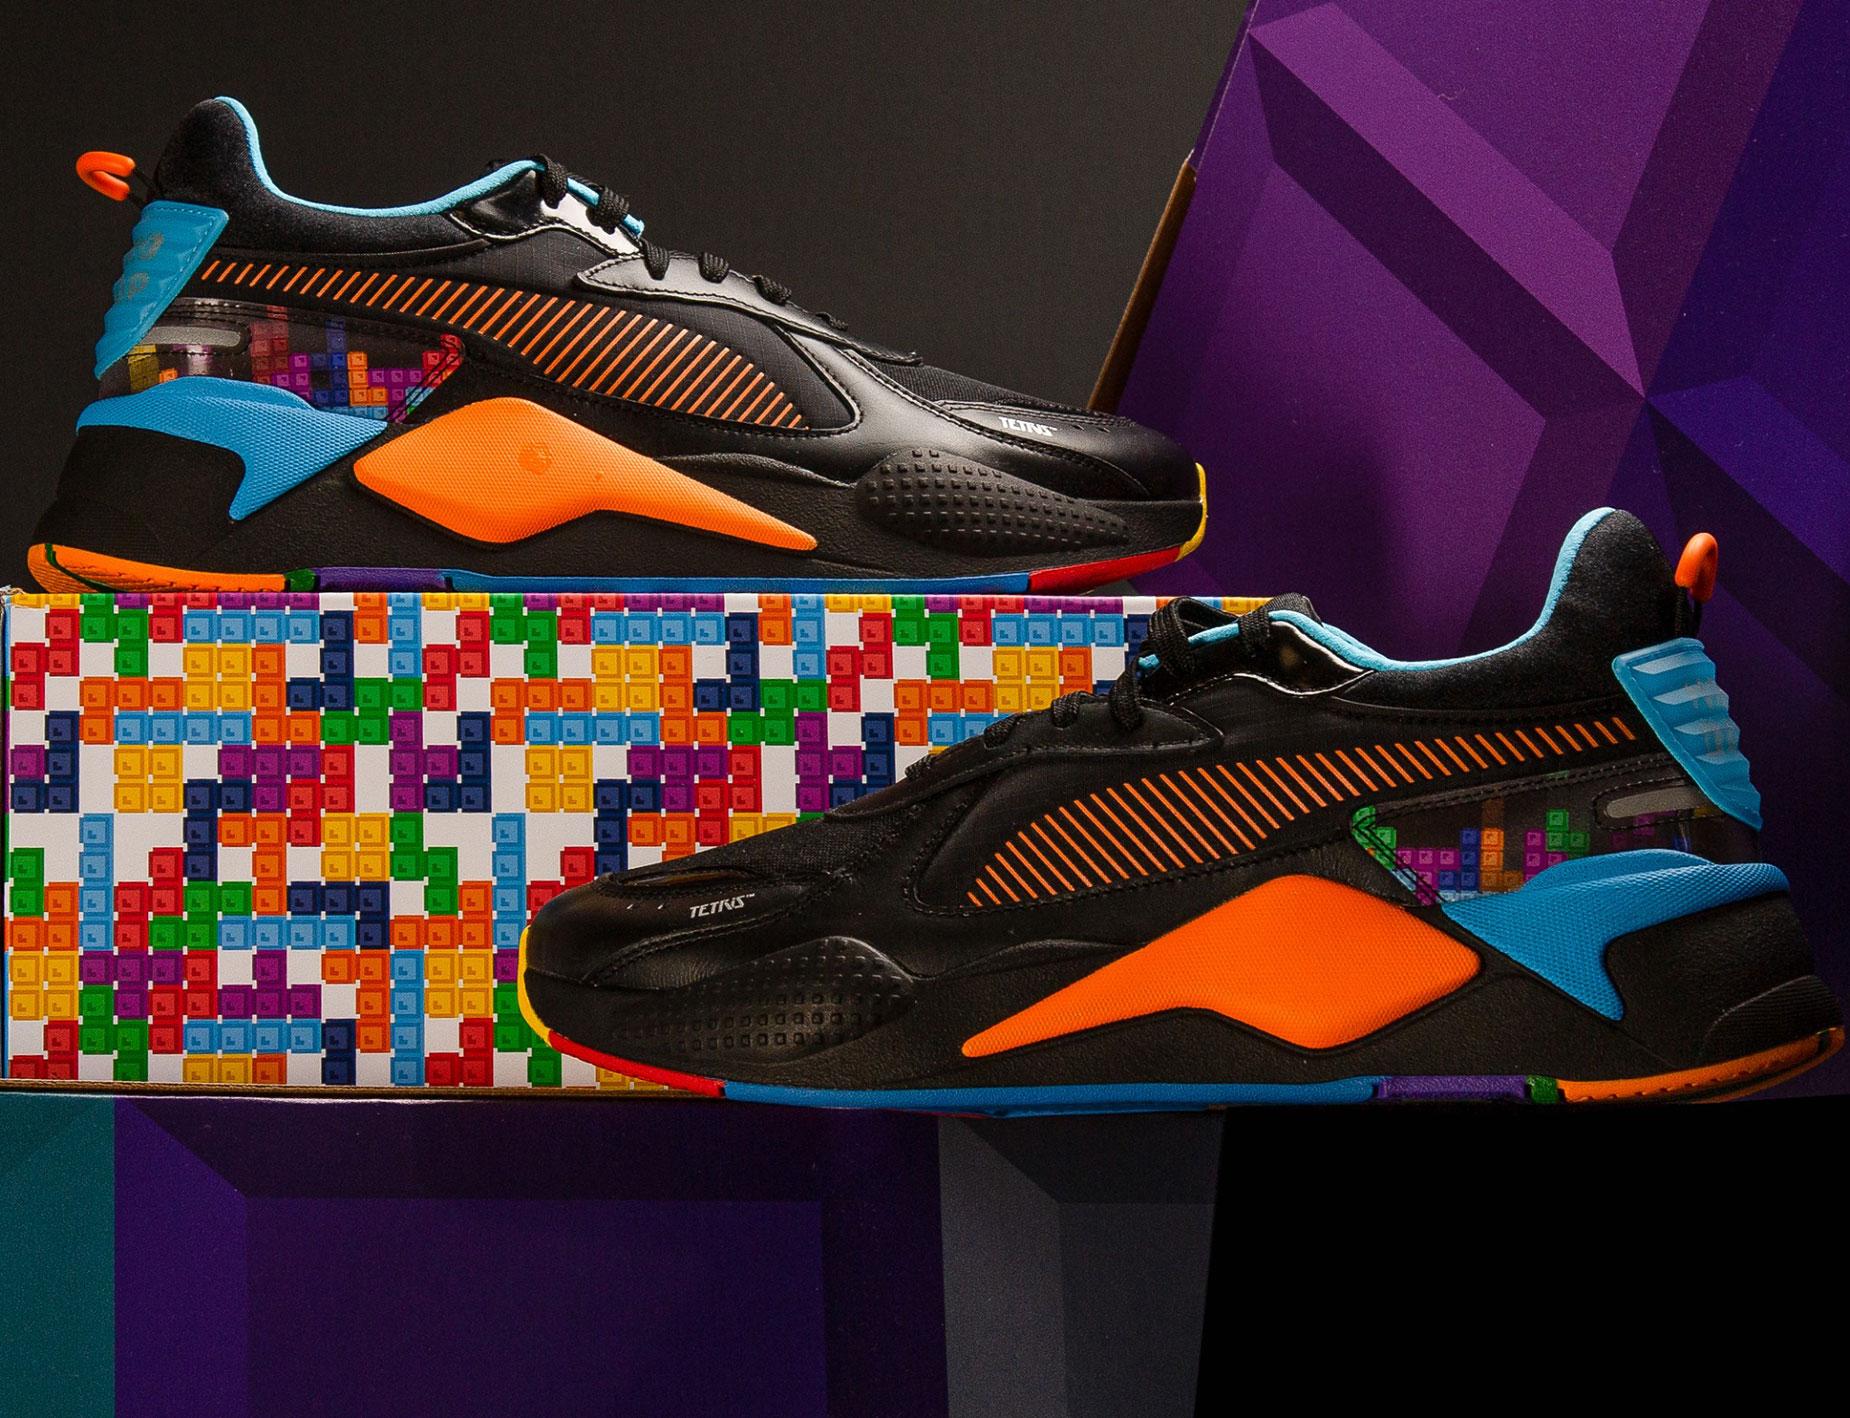 Puma X Tetris Shoes Shirts Jacket And Pants Sneakerfits Com